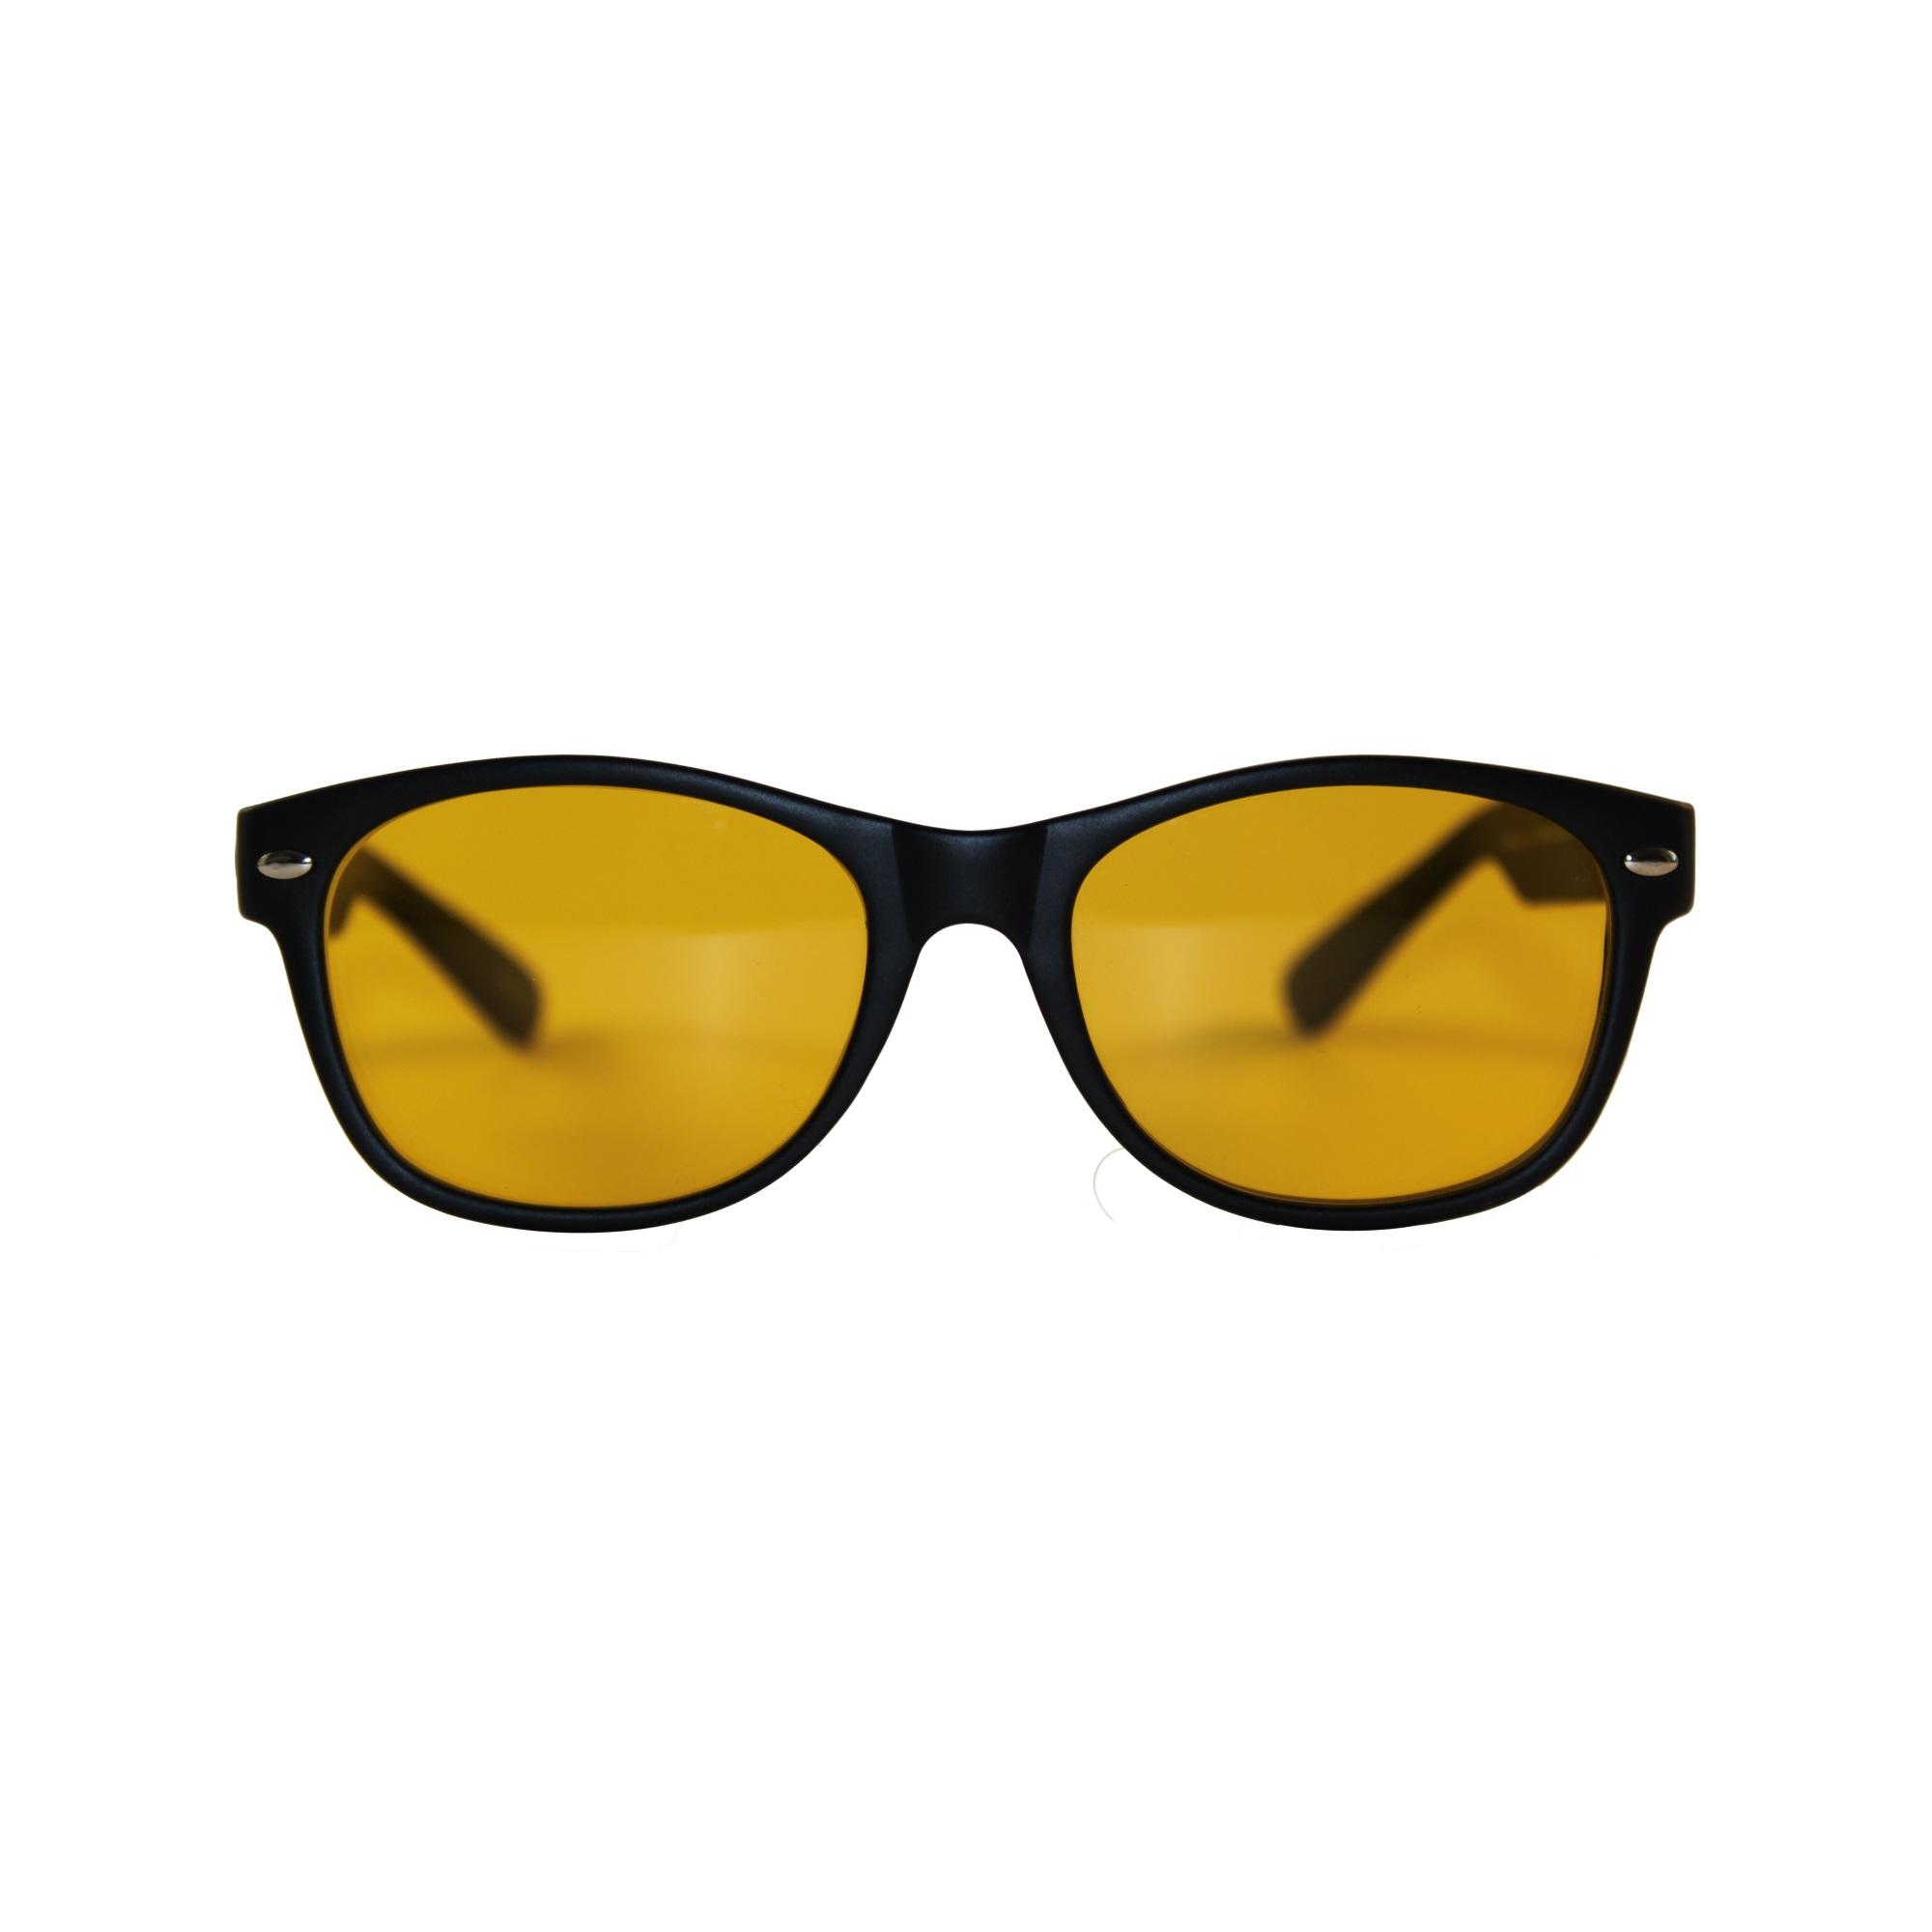 Blue Light Protective Lens Frames | Wayfarer Style